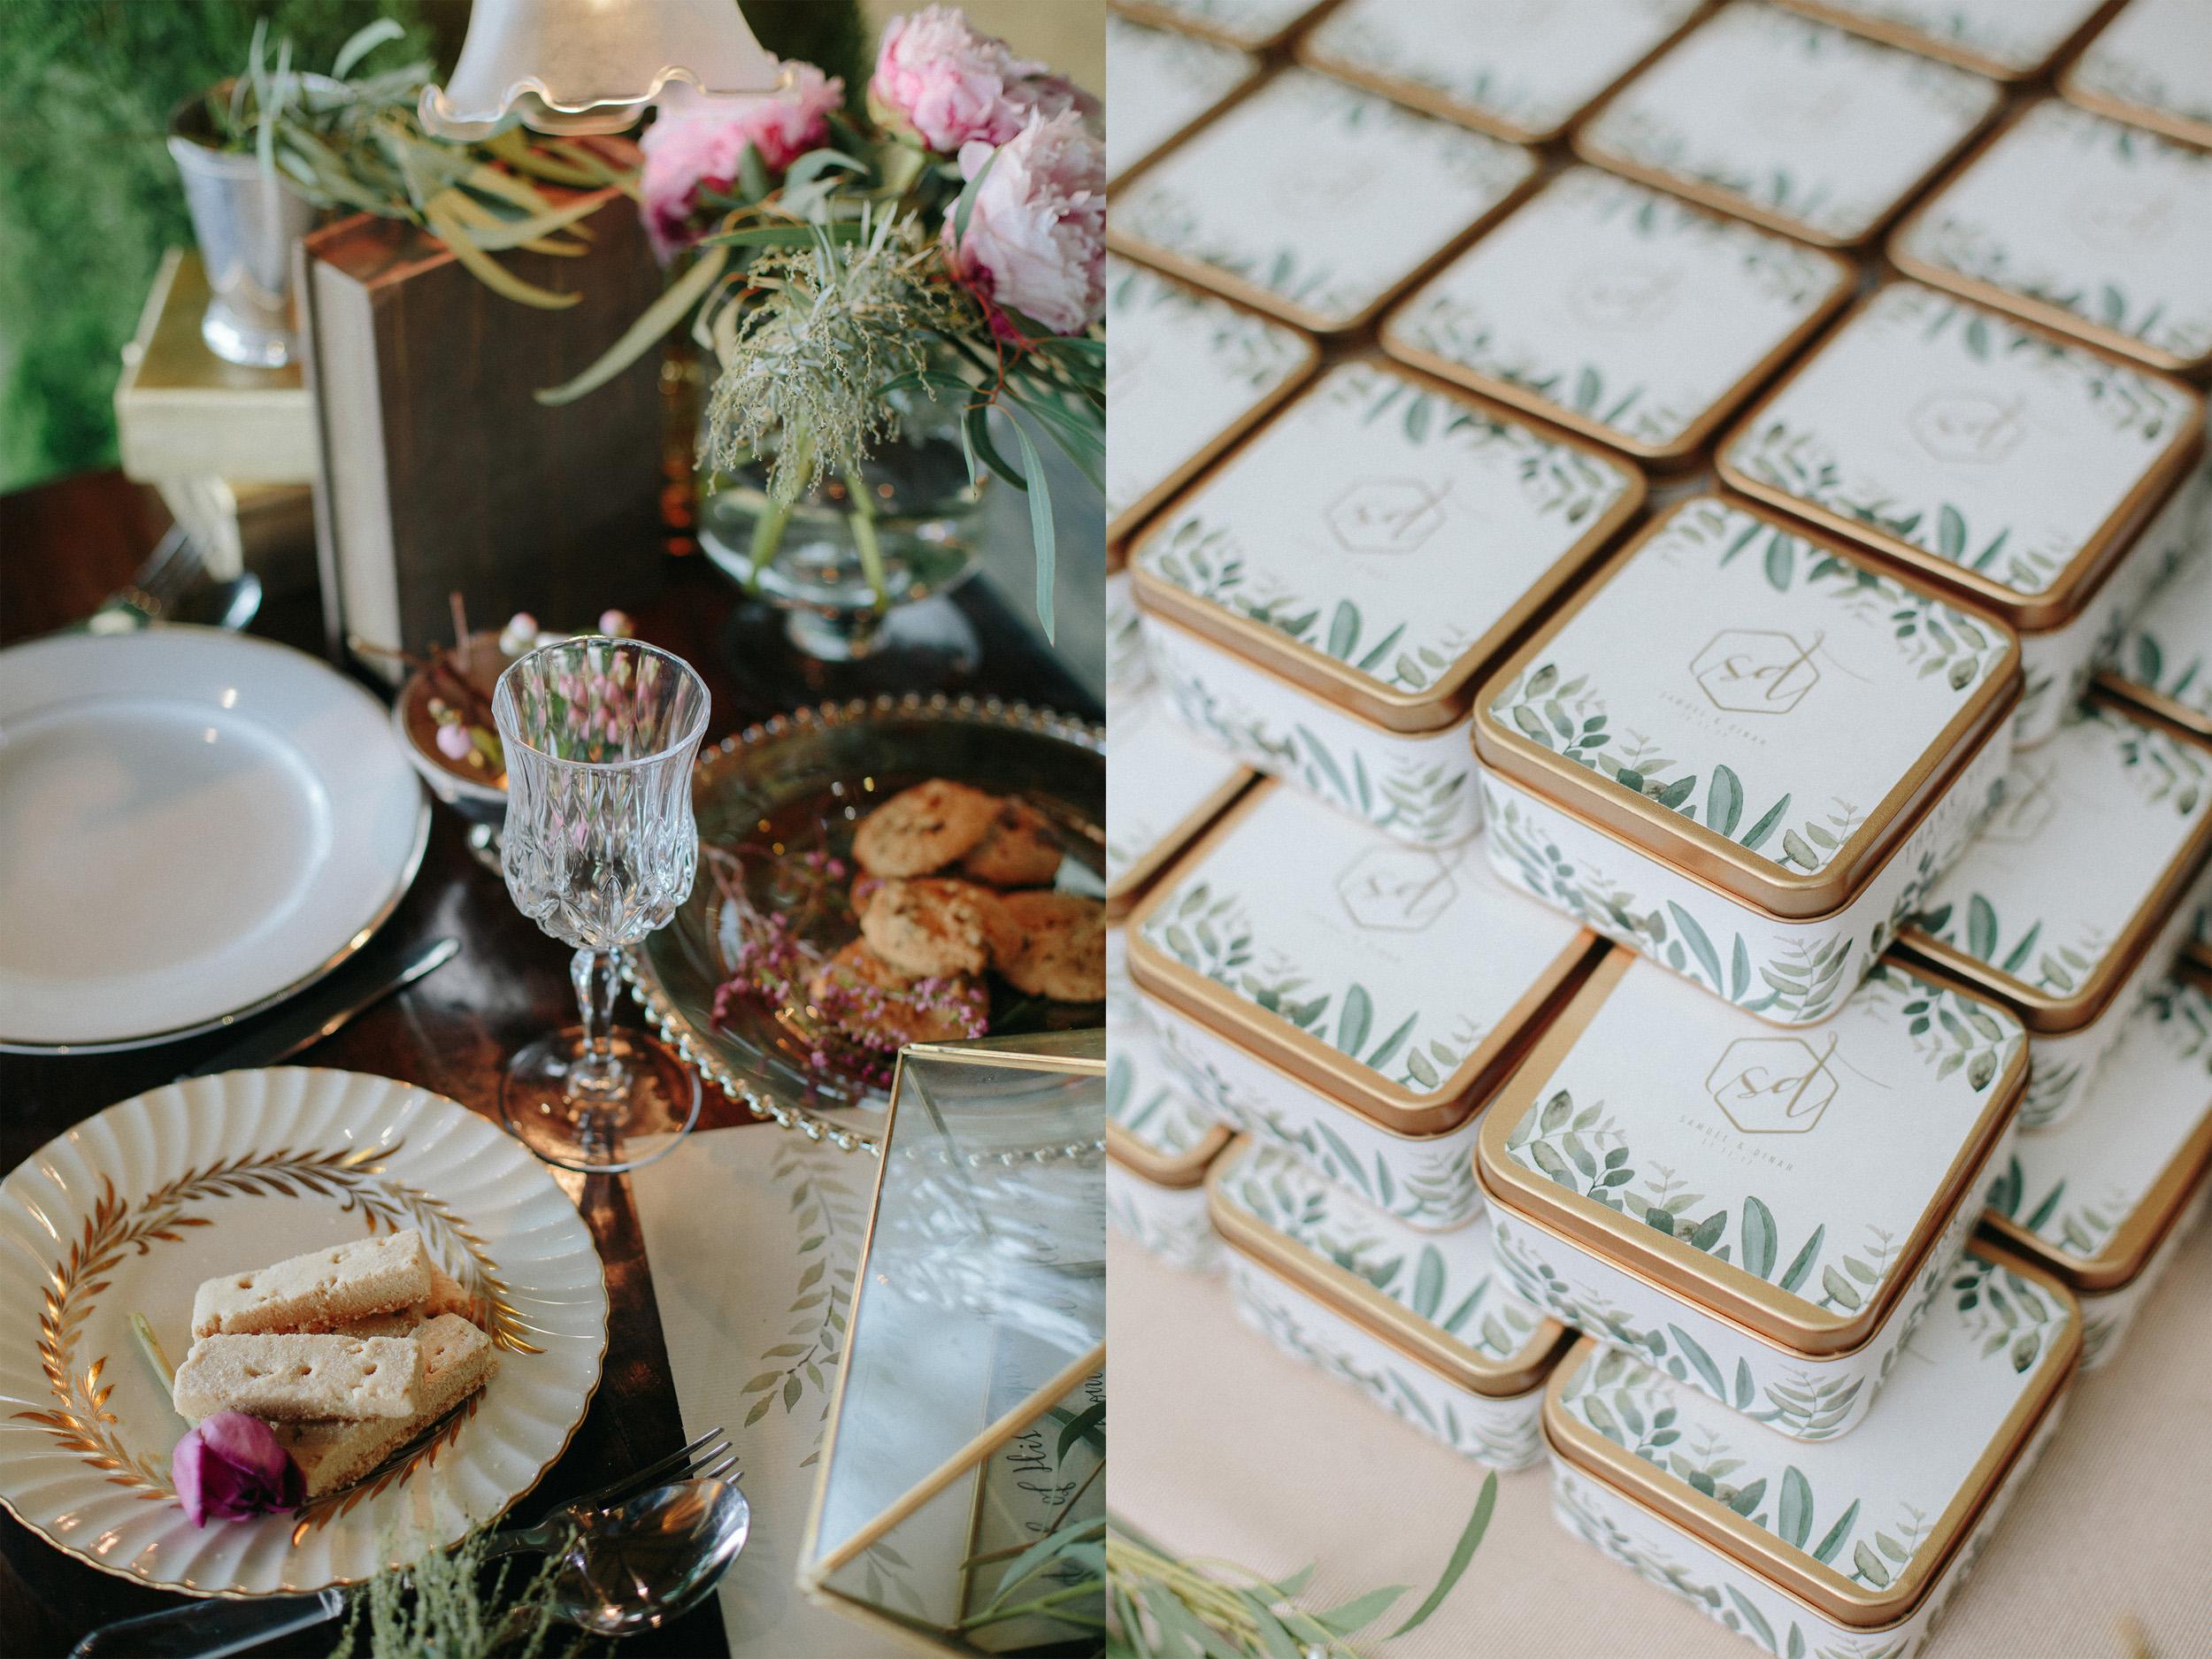 singapore-wedding-photographer-photography-wmt2017-121.jpg